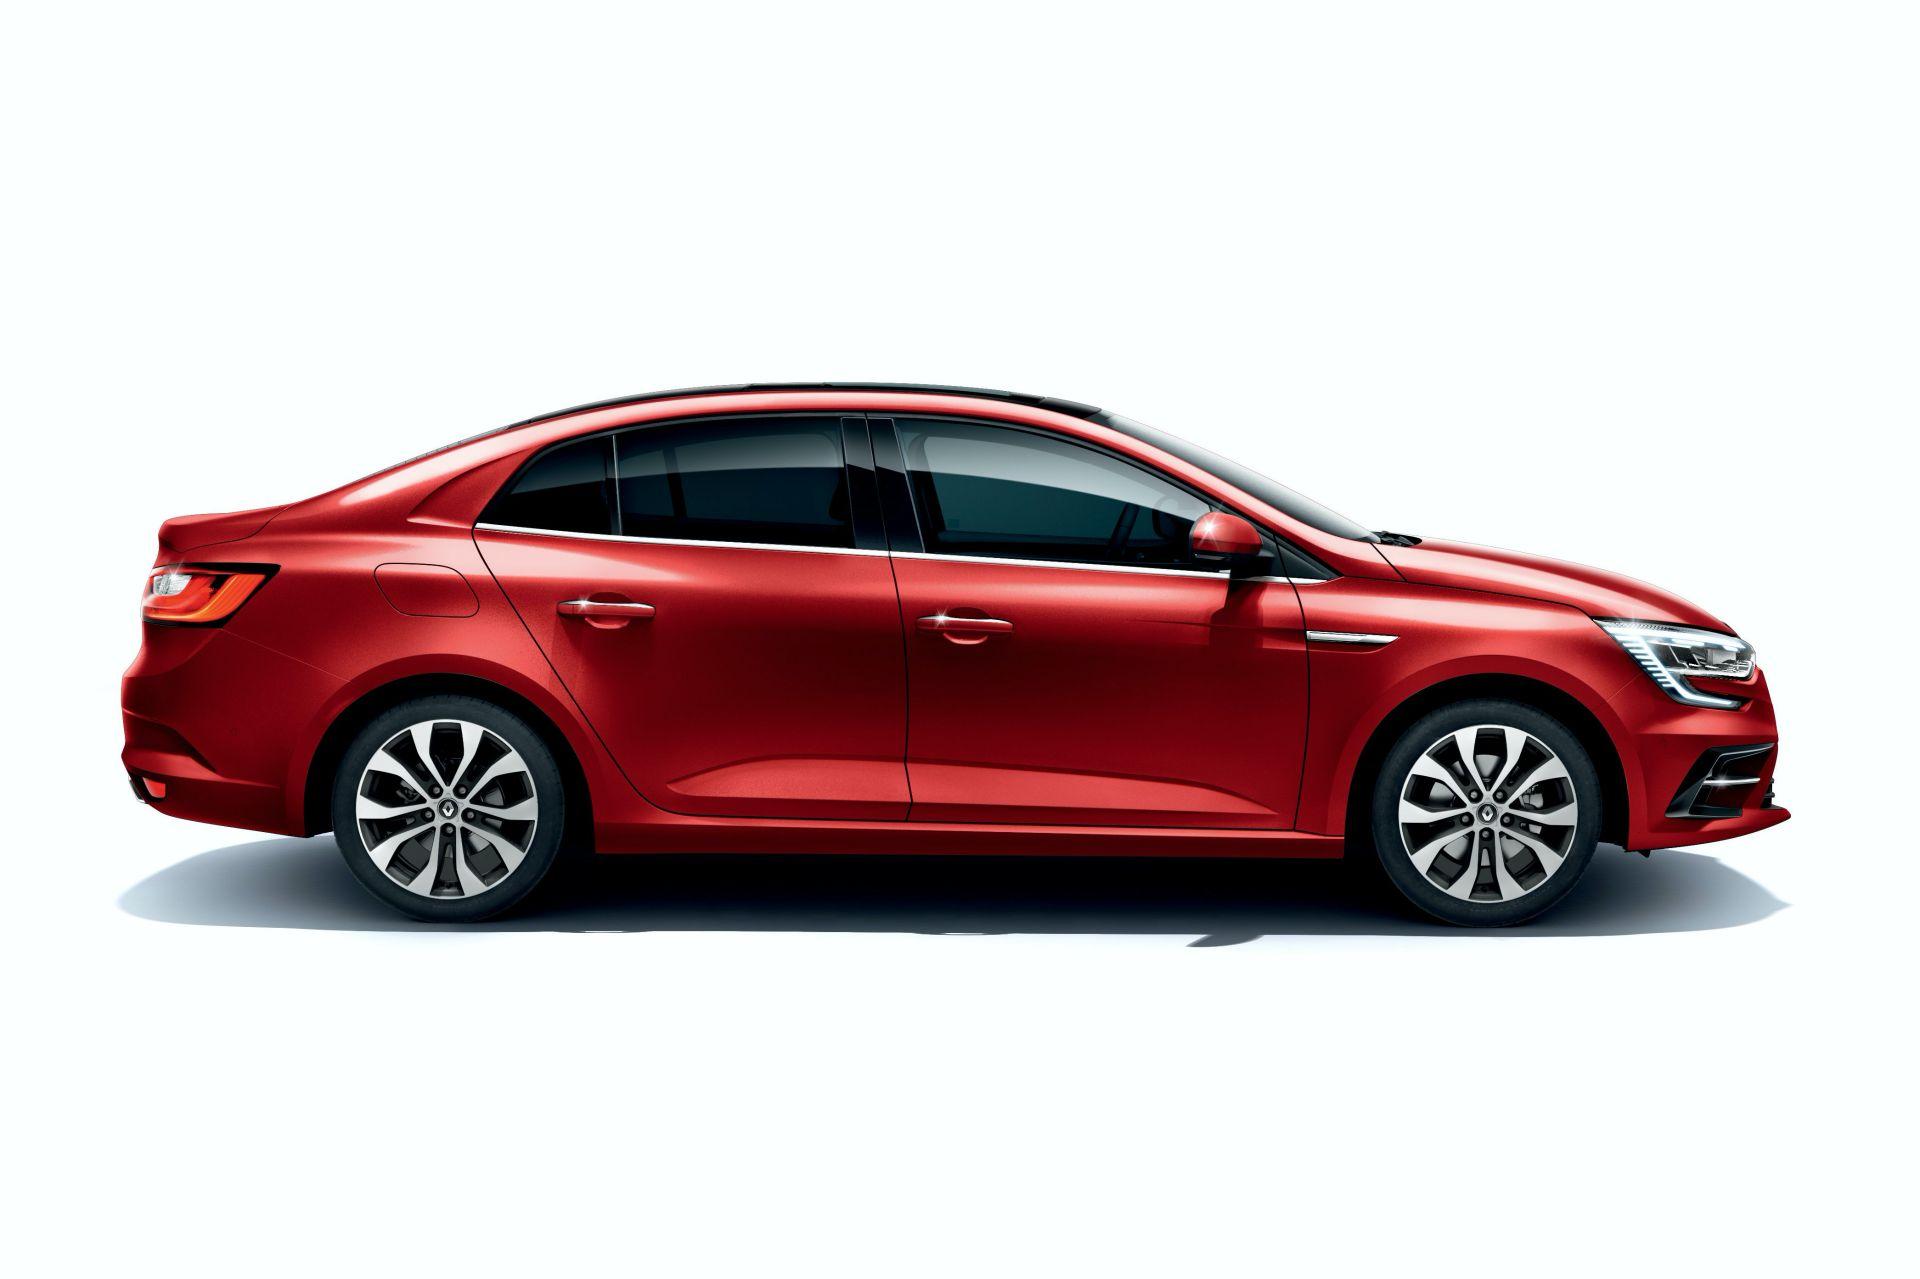 Renault-megane-grand-coupe-sedan-facelift-2021-11